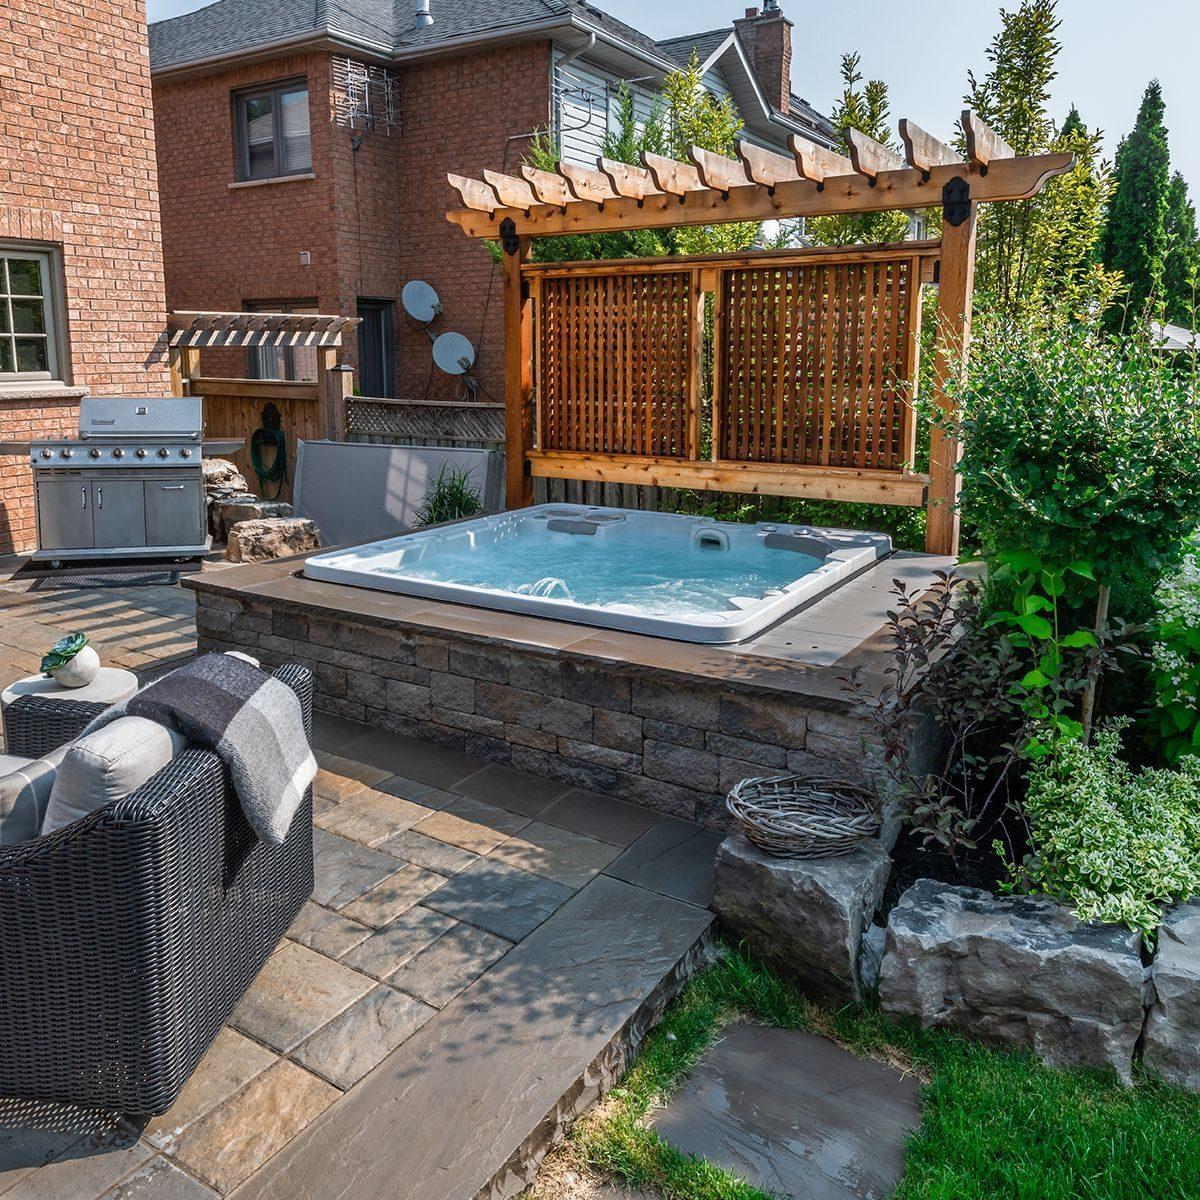 Inspiring Hot Tub Patio Design Ideas For Your Outdoor ...